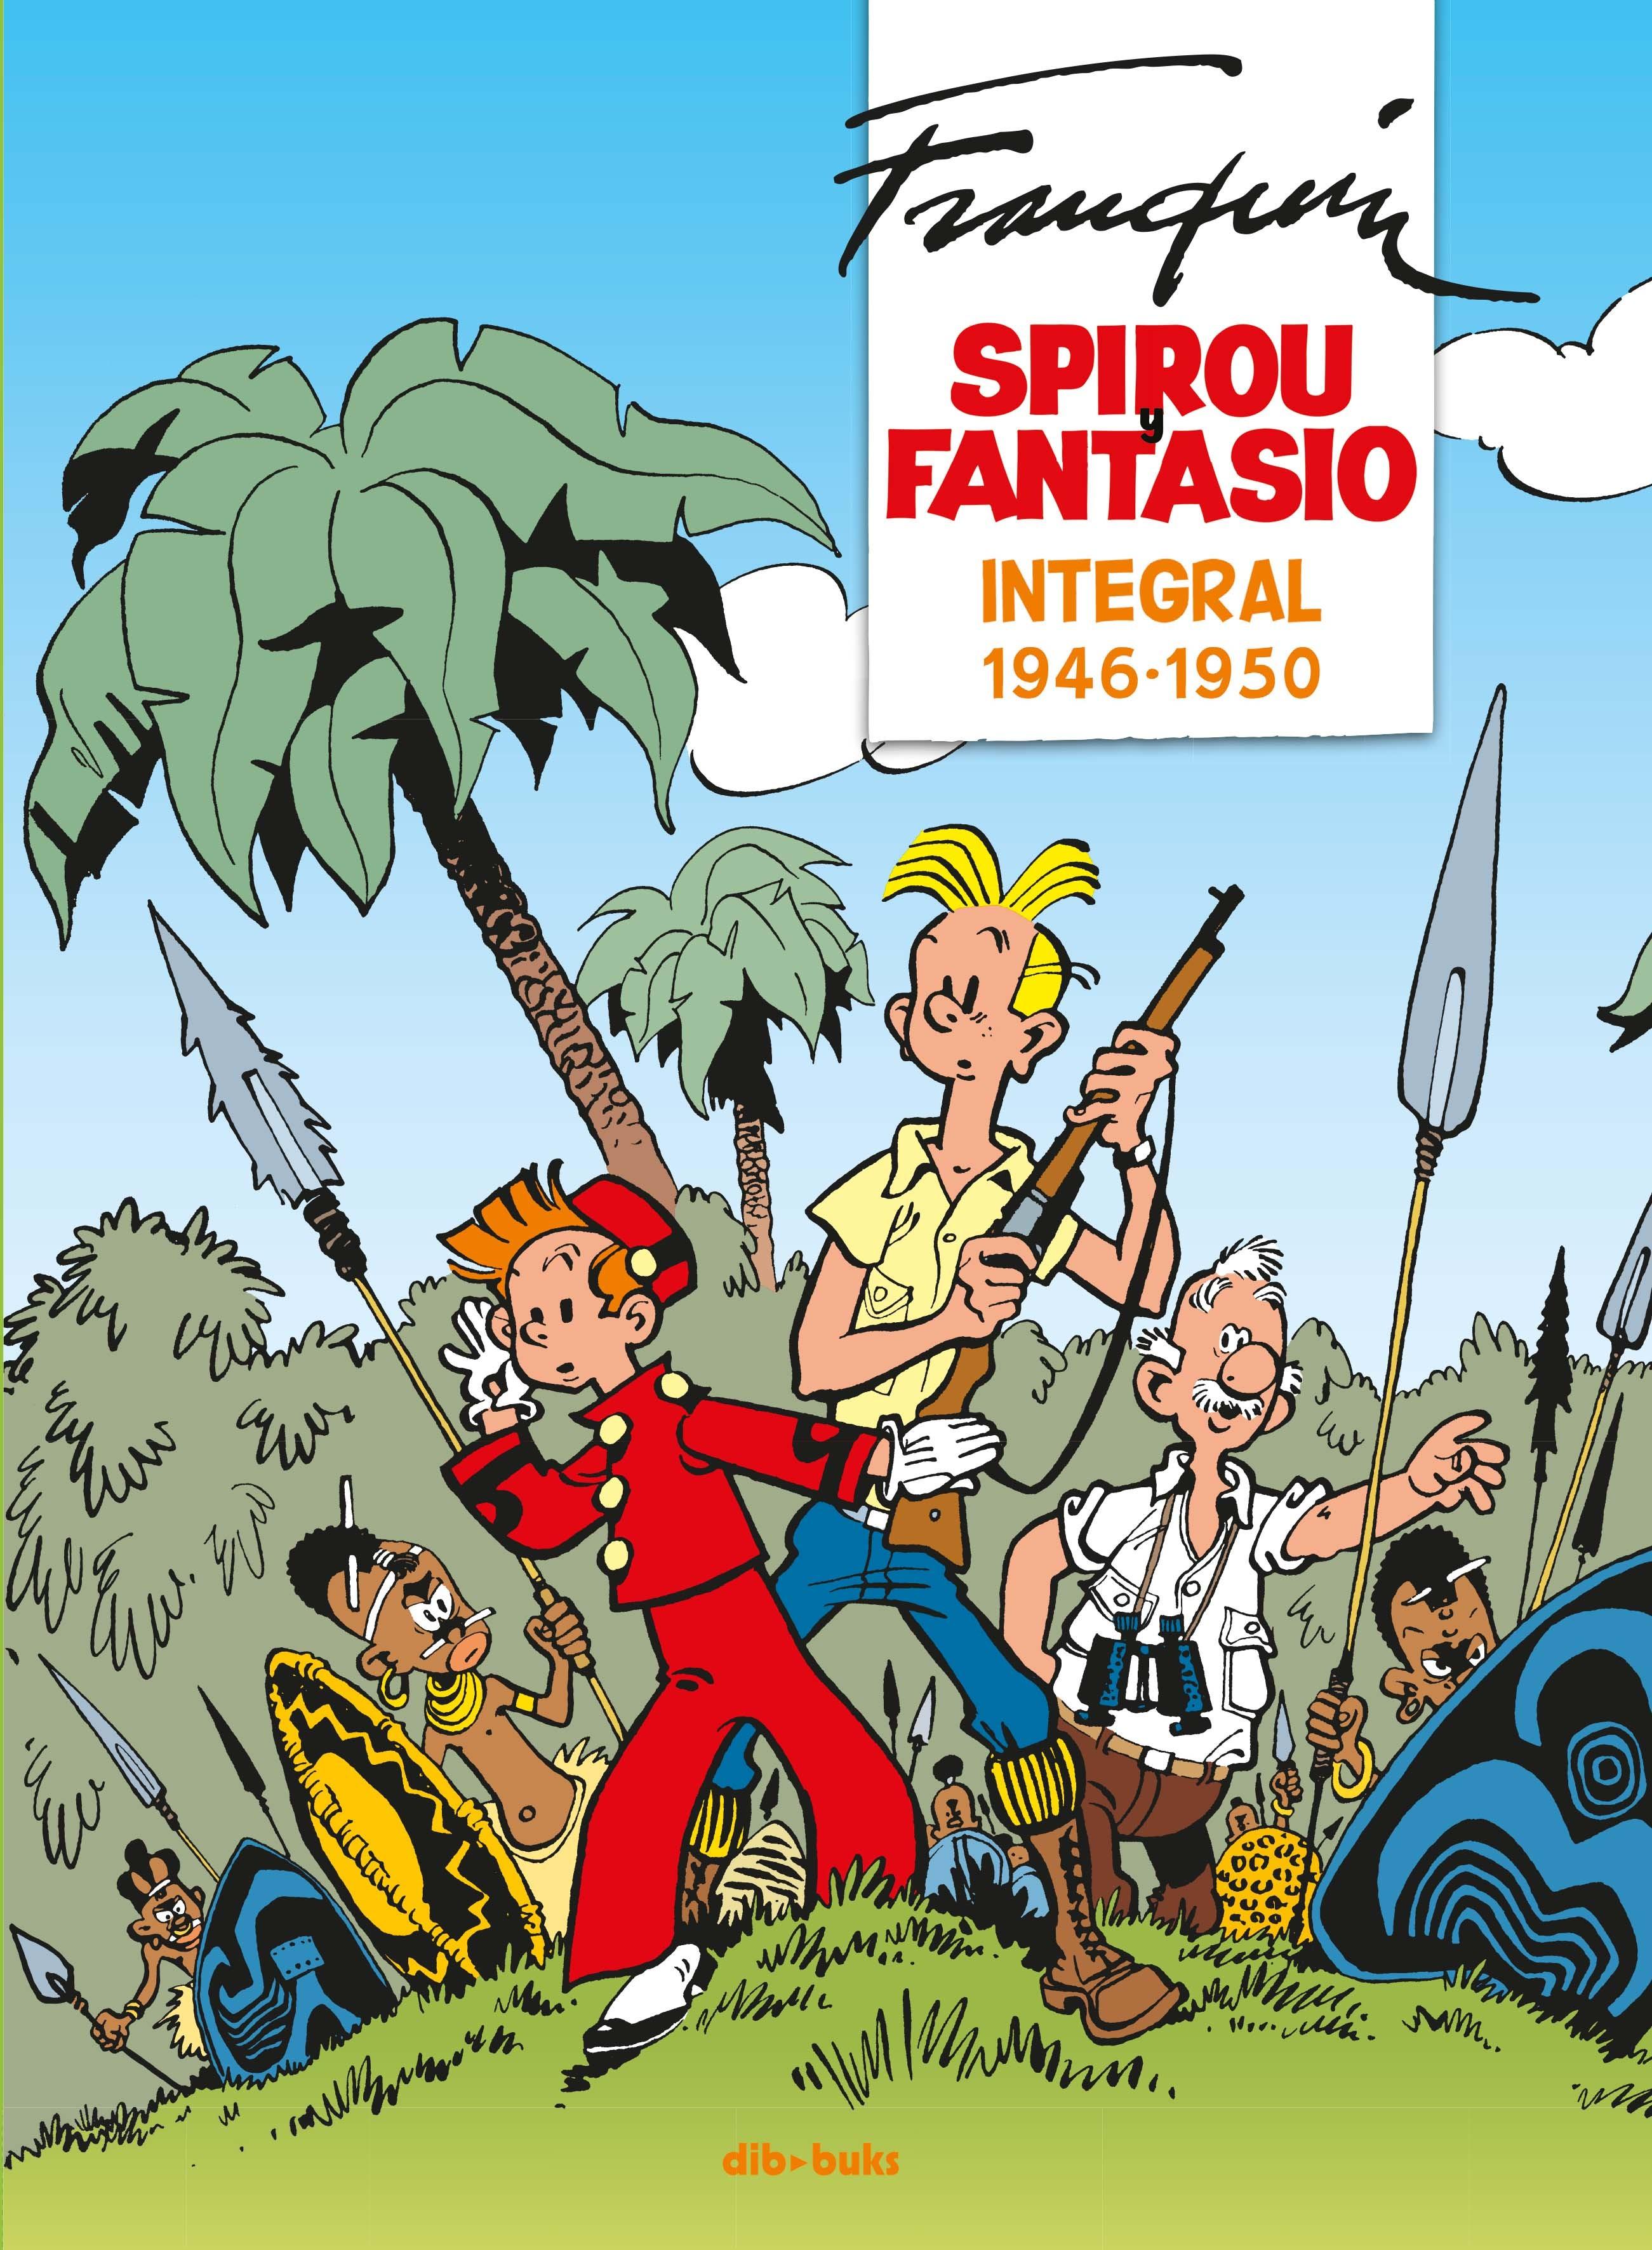 cubierta-spirou-integral Franquin-1_28ag.indd